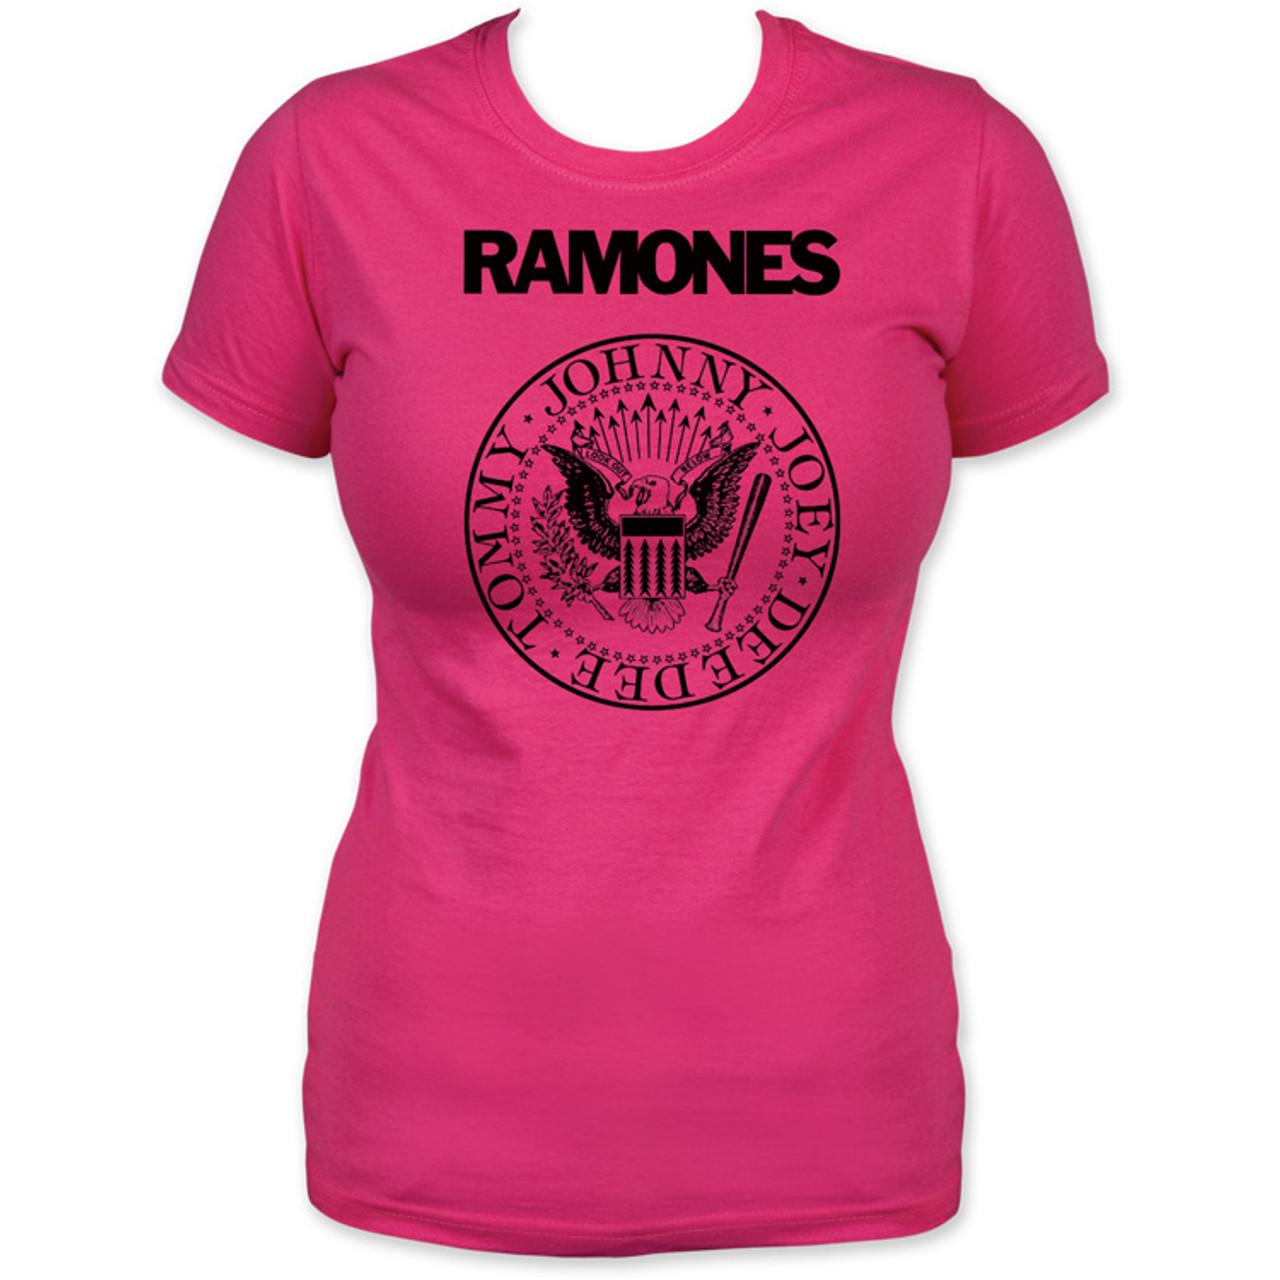 281c19d85 Ramones Logo T-shirt - Ramones Presidential Seal Logo. Women's Pink ...